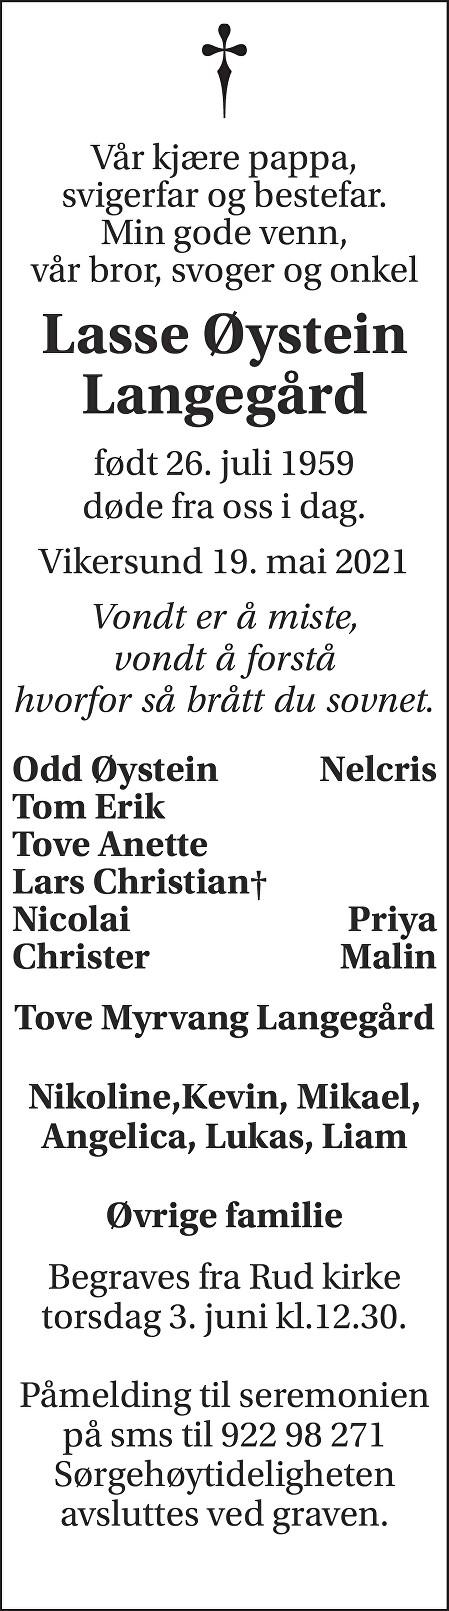 Lasse Øystein Langegård Dødsannonse